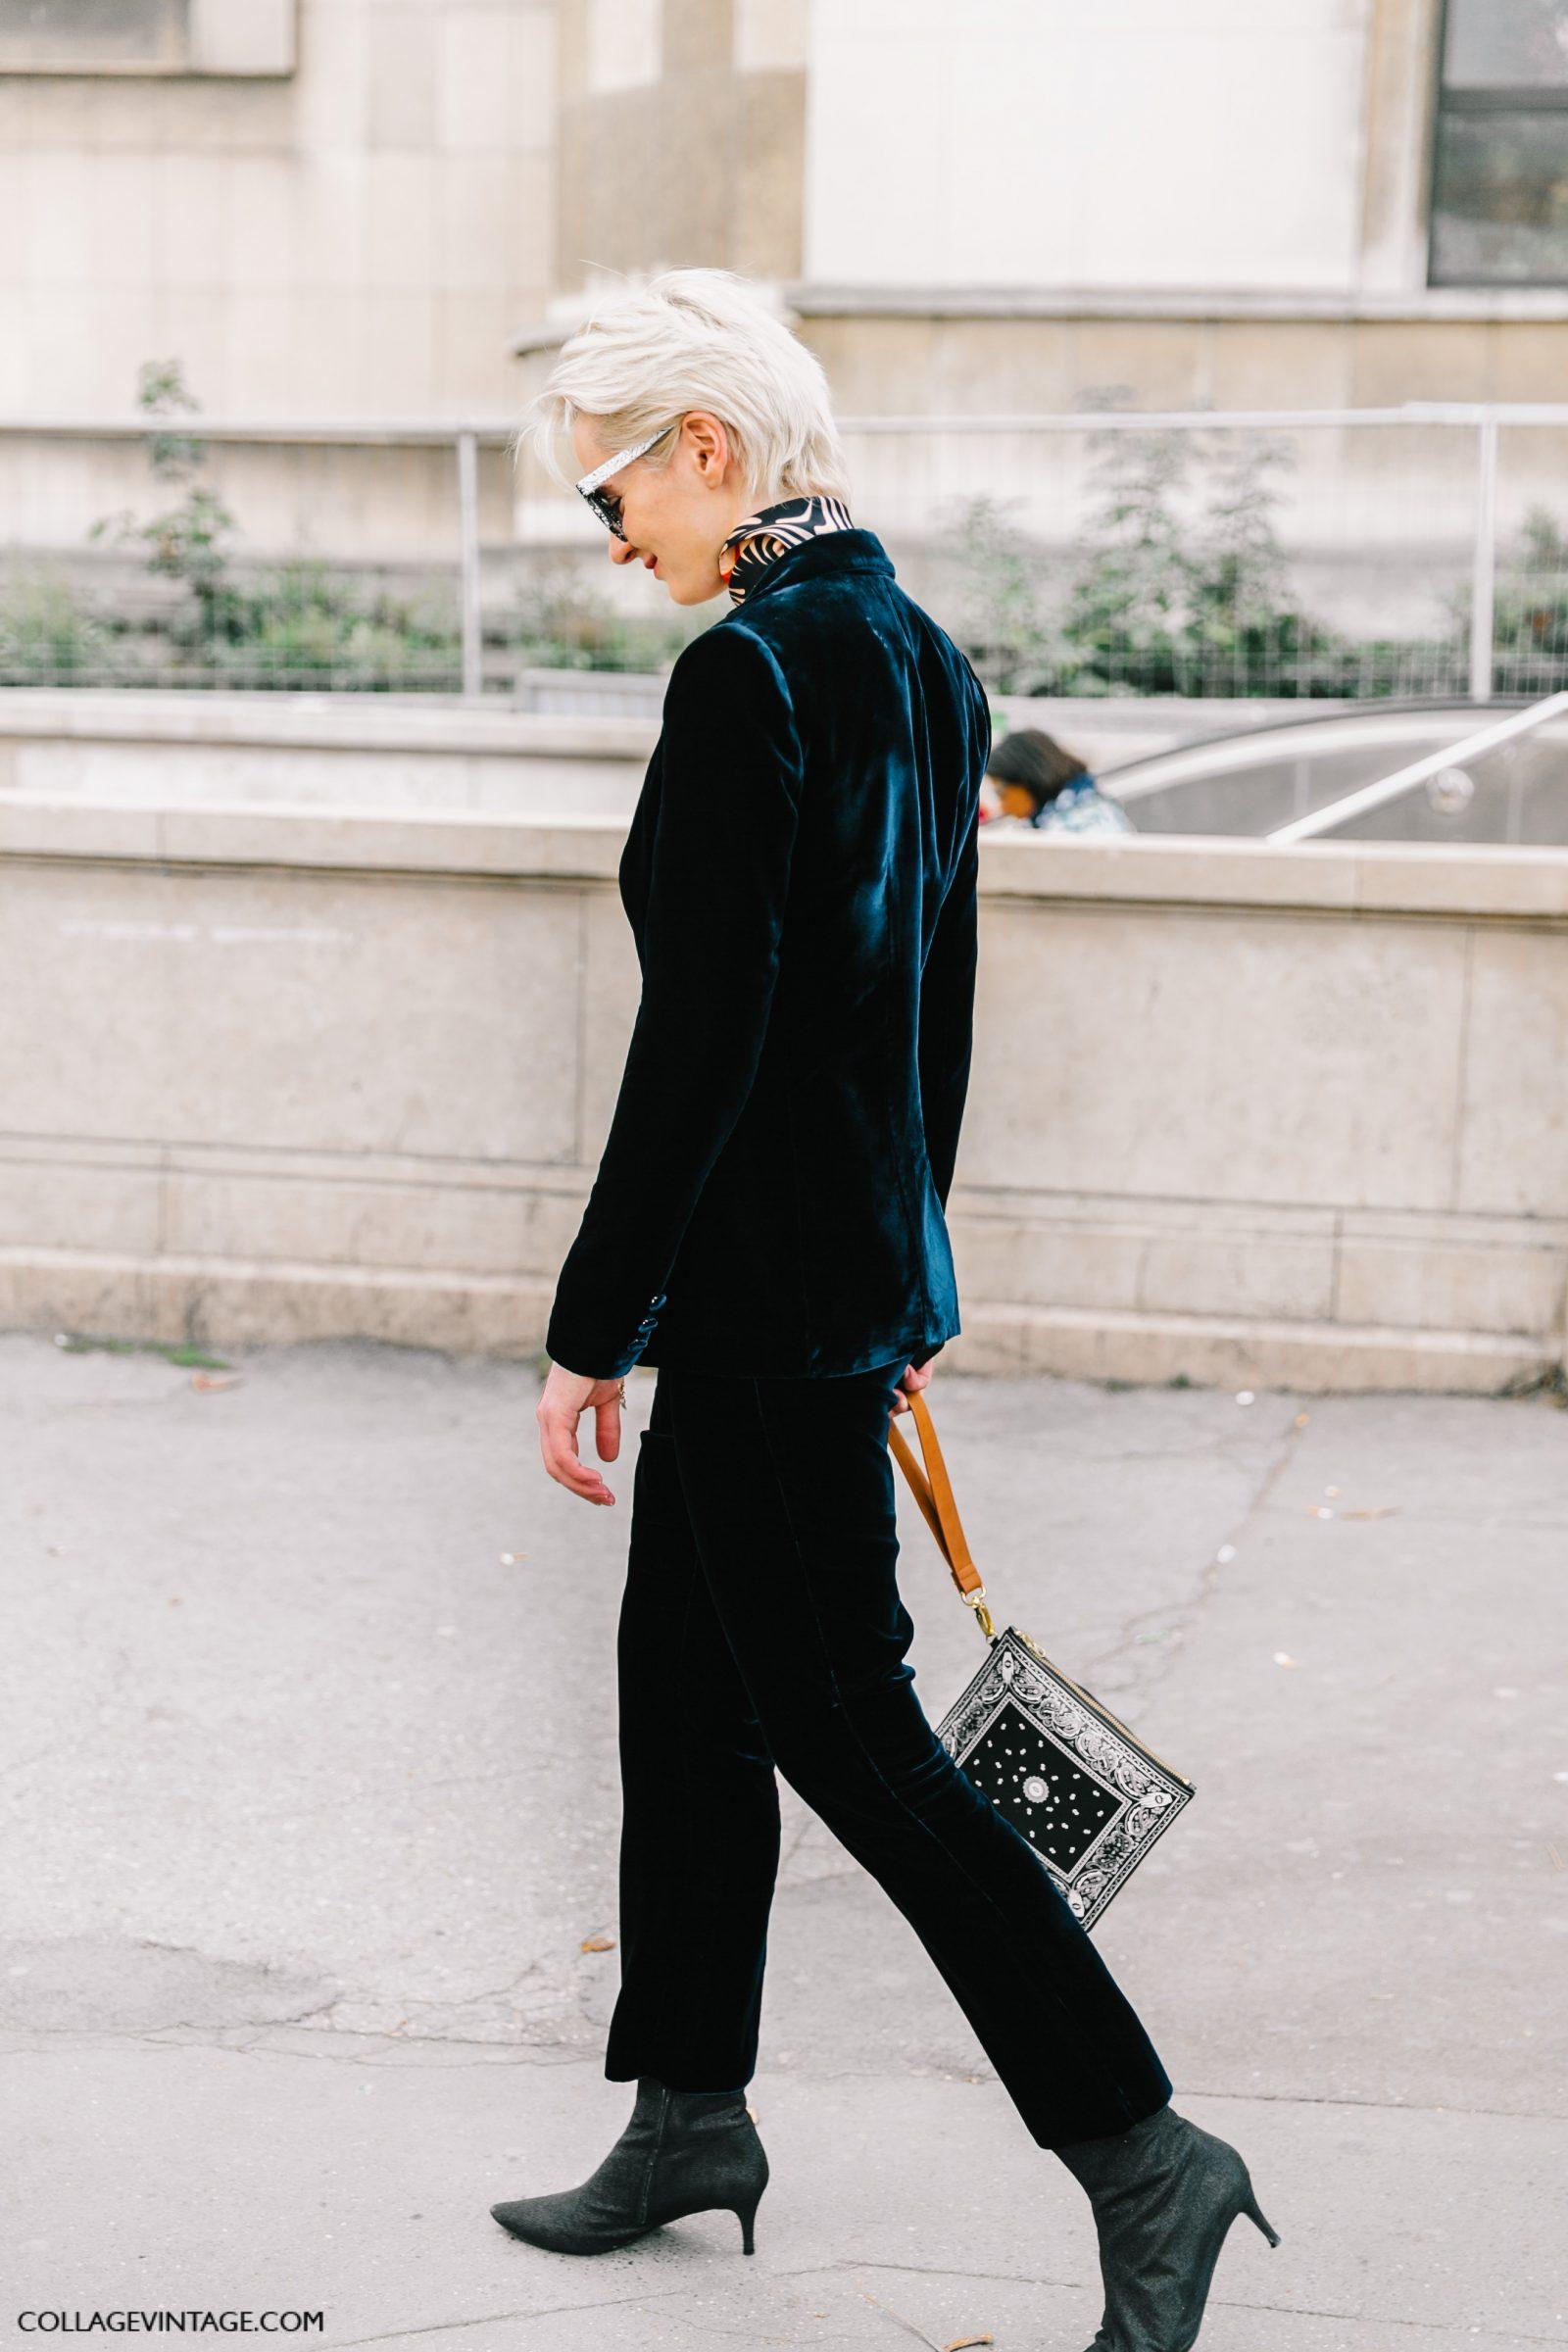 pfw-paris_fashion_week_ss17-street_style-outfits-collage_vintage-chloe-carven-balmain-barbara_bui-153